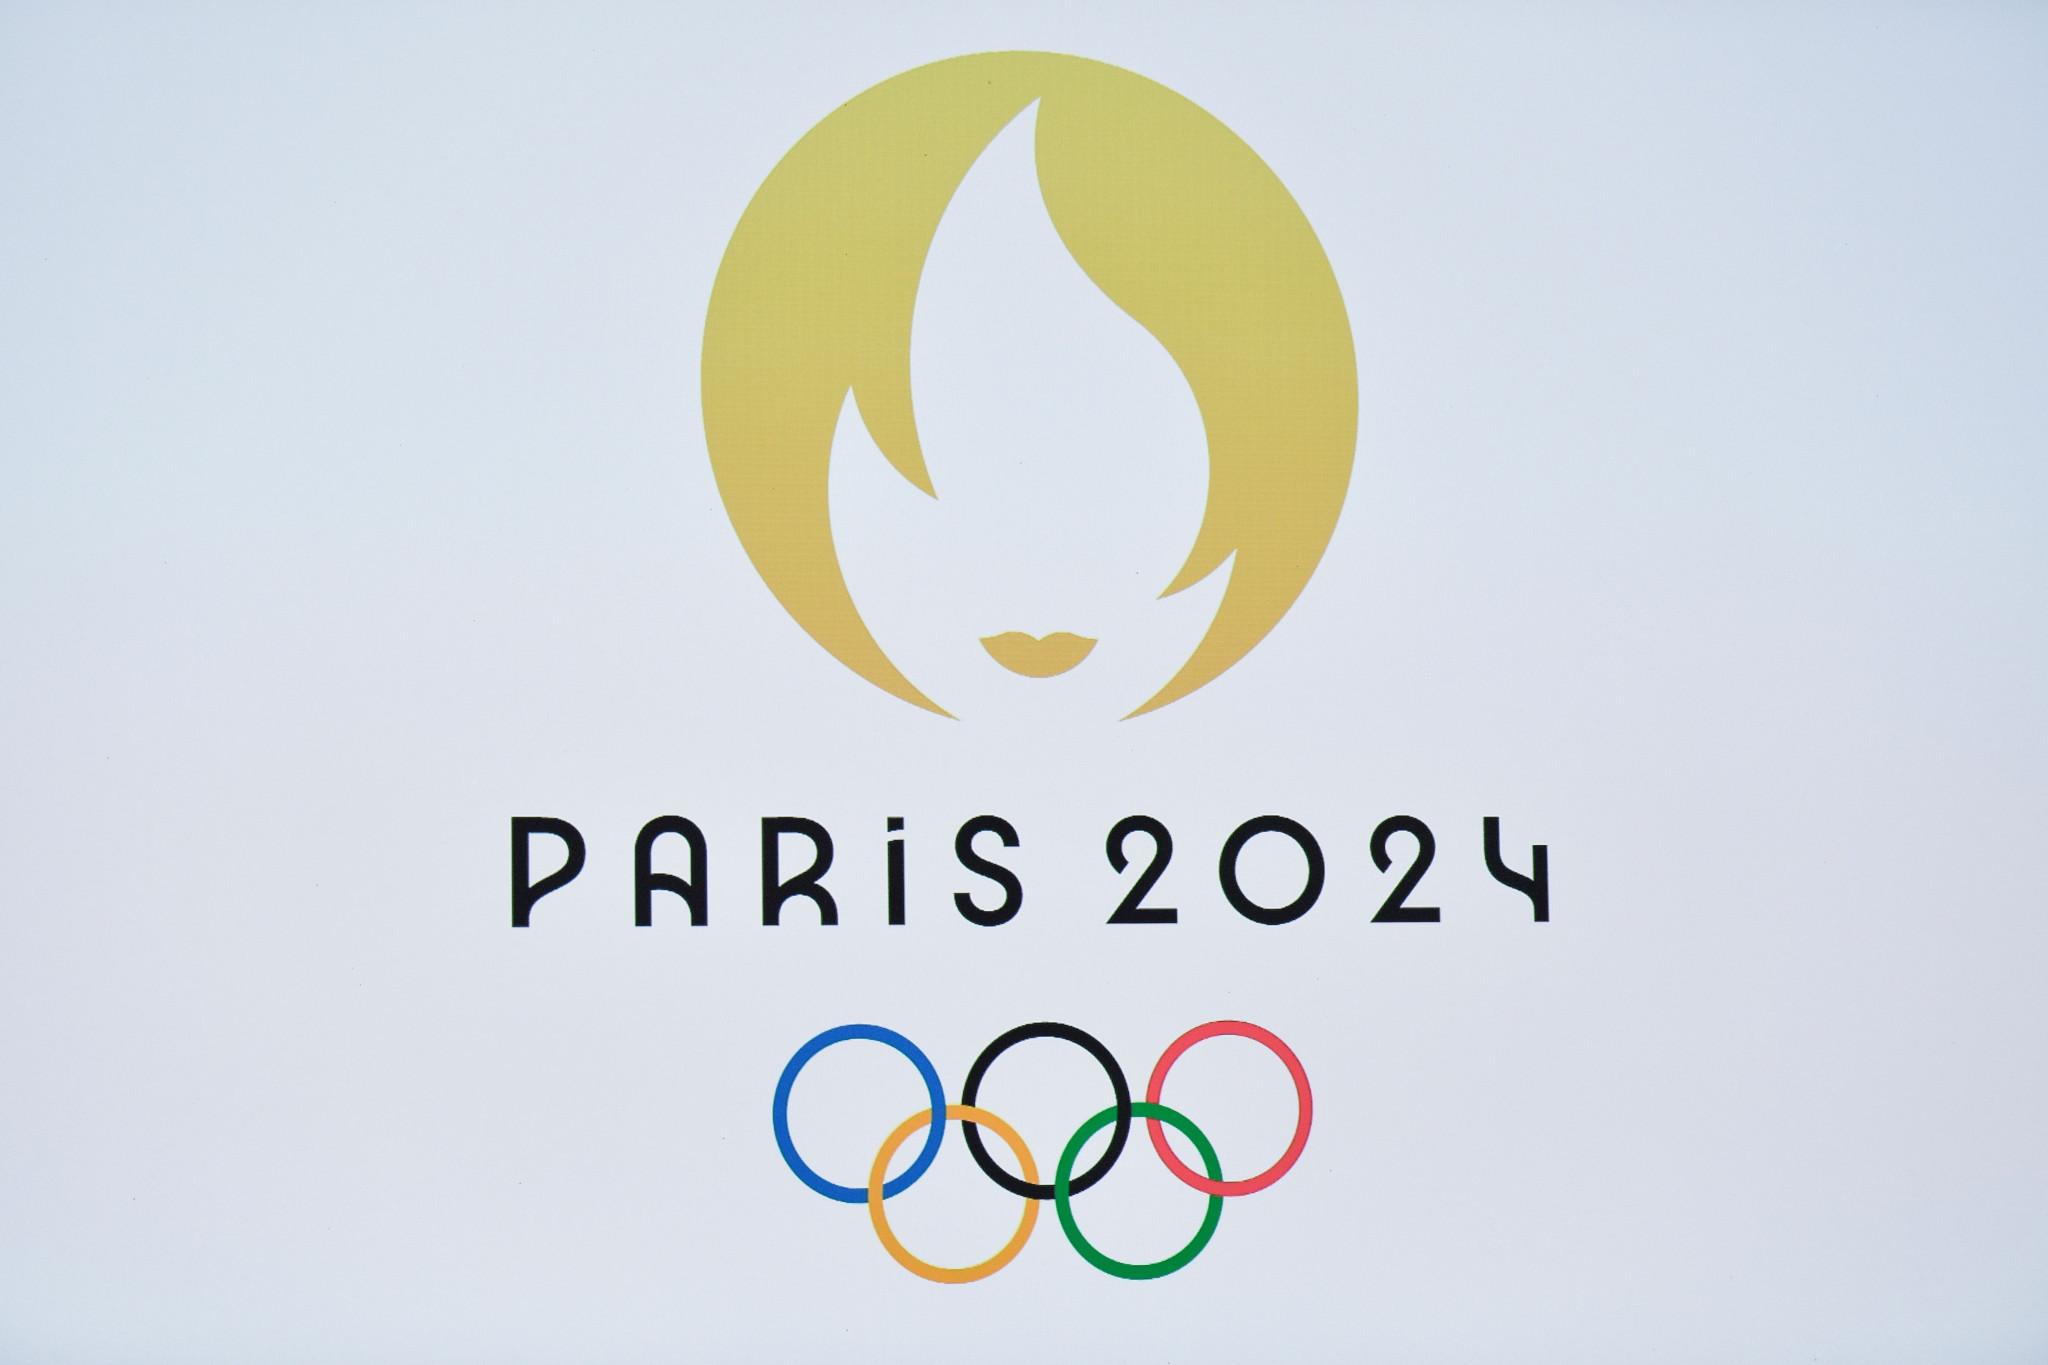 Paris 2024 appoint sports marketing agencies to aid sponsorship programme